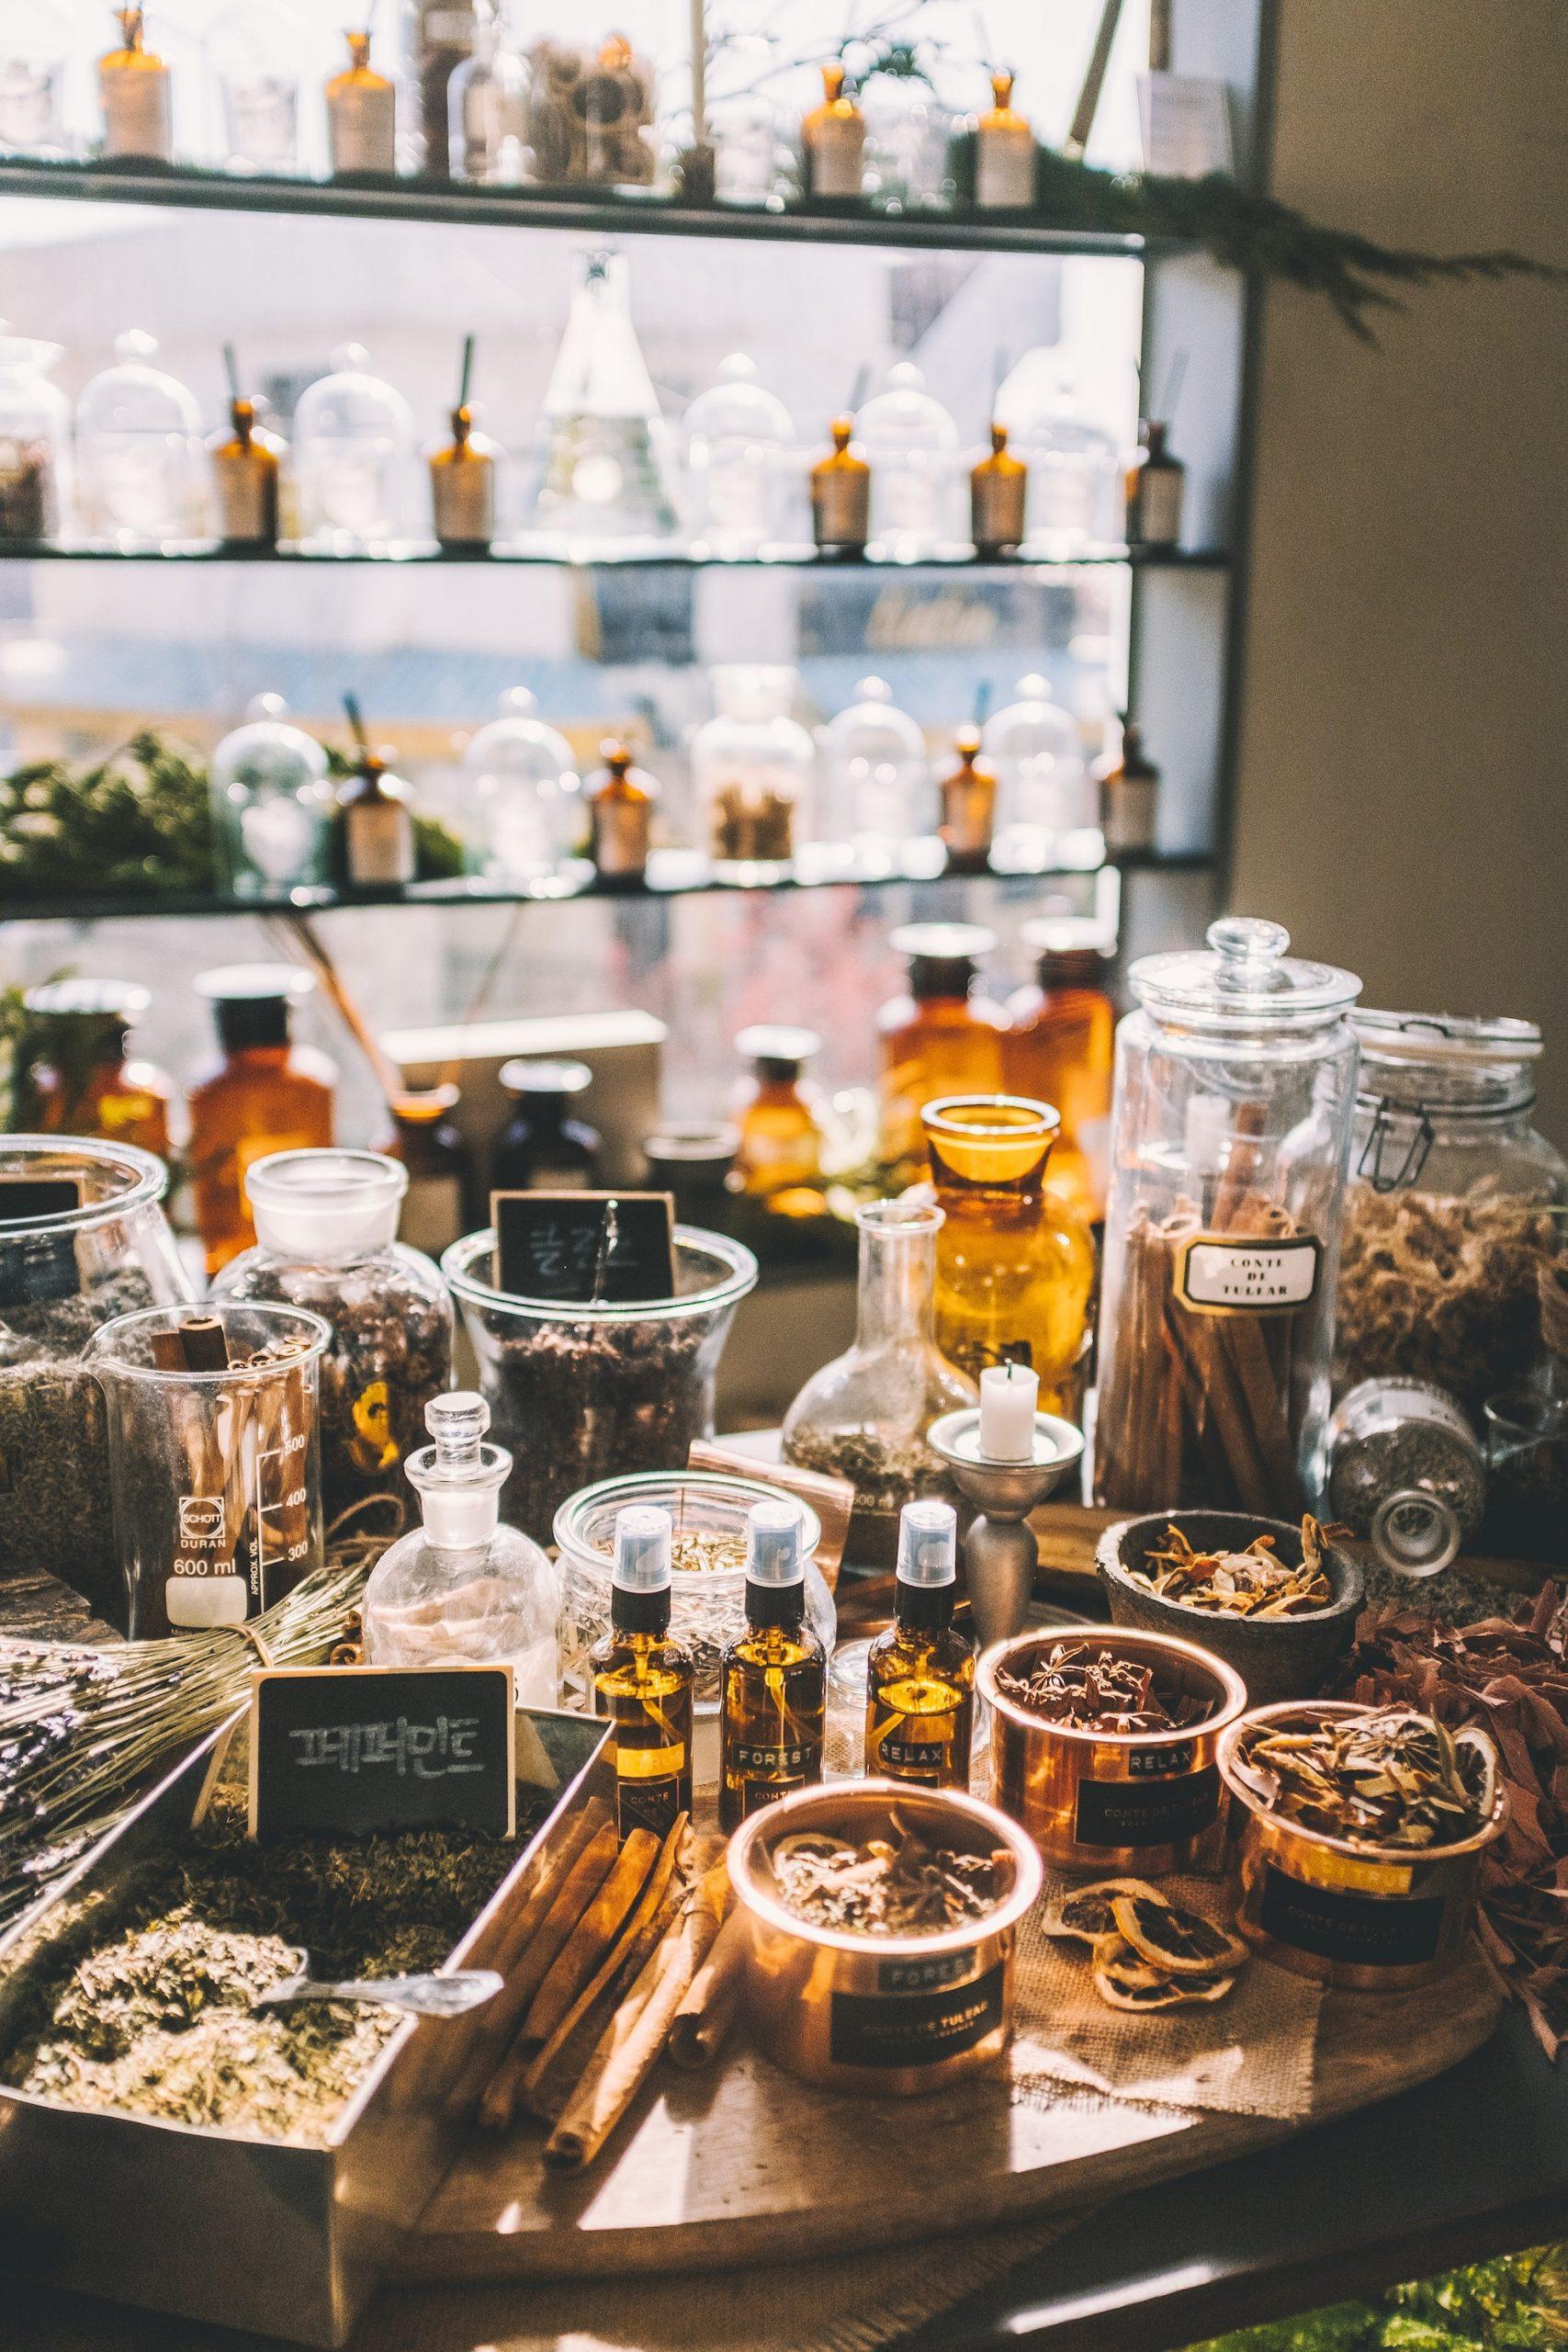 Chinese medicinal herbs in jars